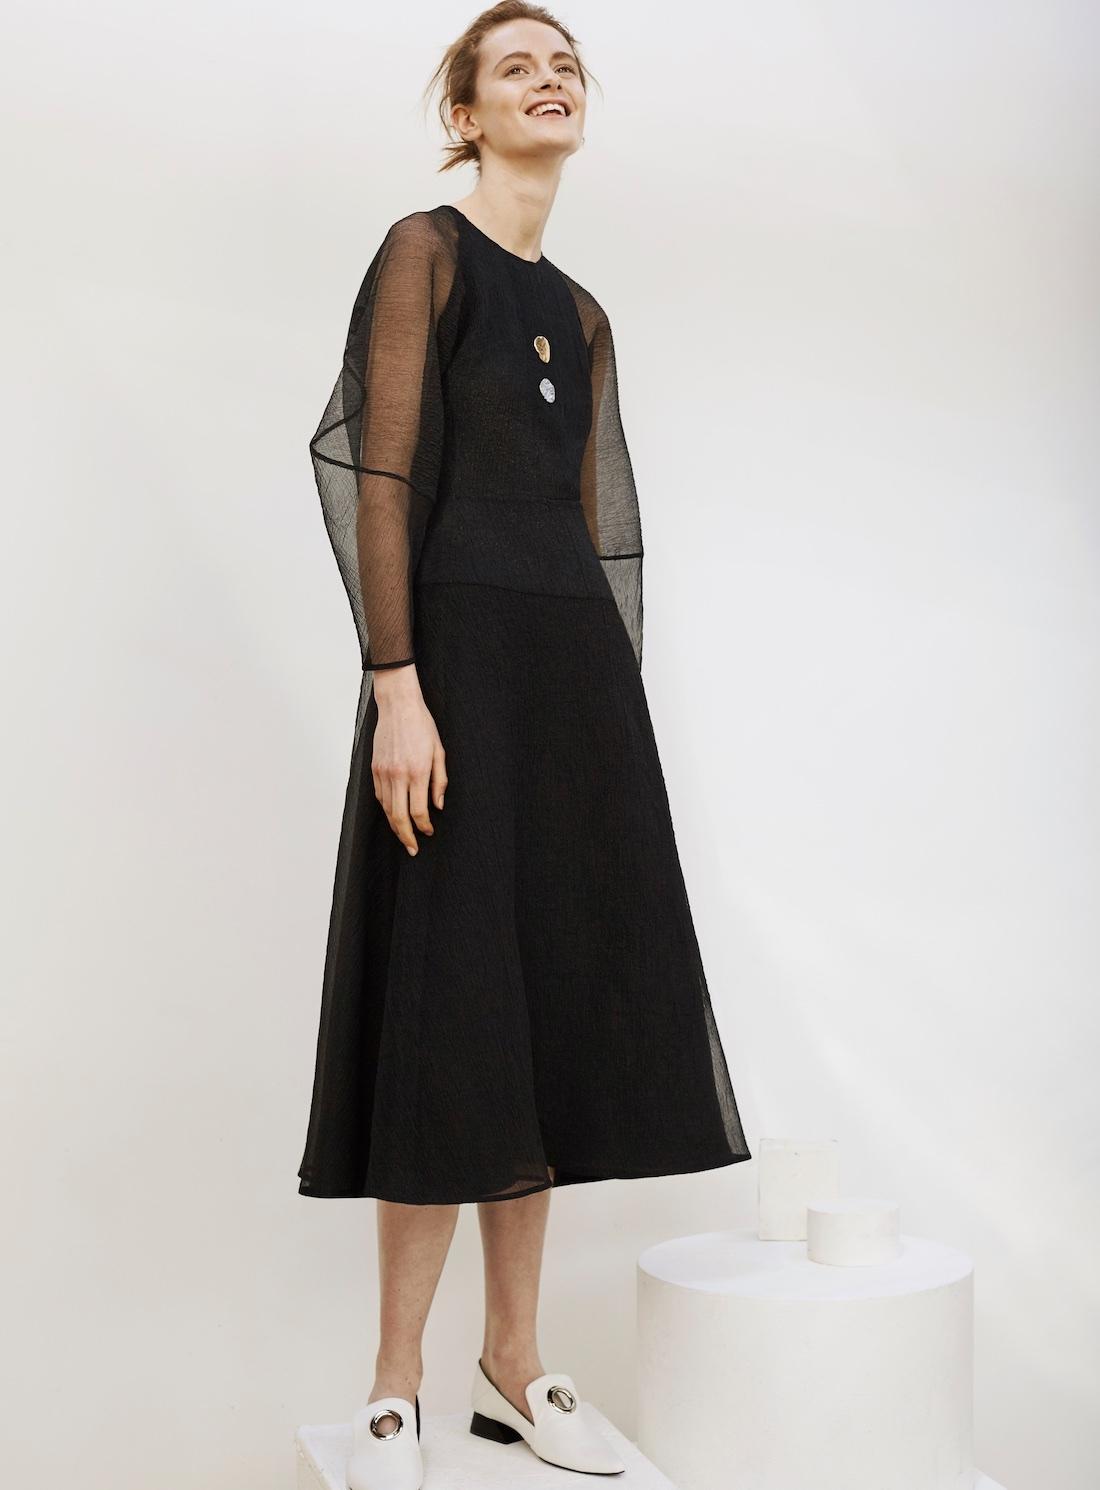 Rejina Pyo Black Exclusive Edition Elliot Dress In Black